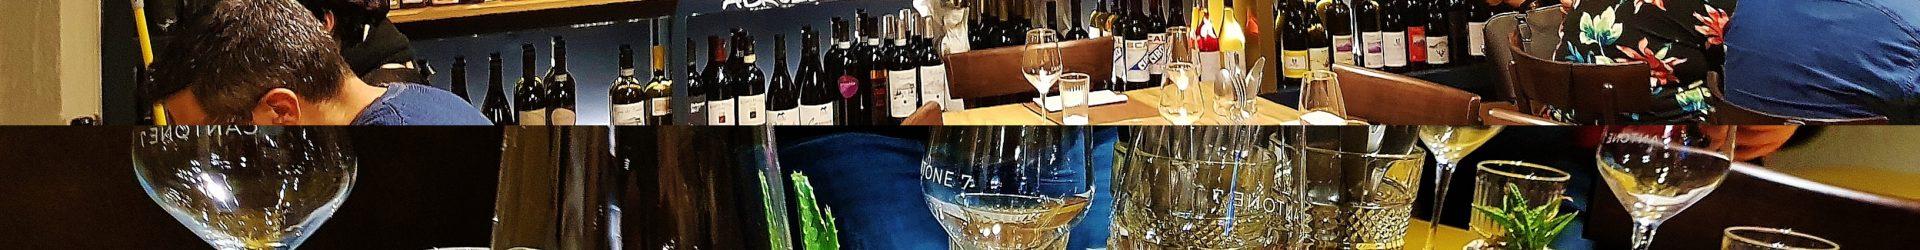 CANTONE 7: vino,bottega e cucina!